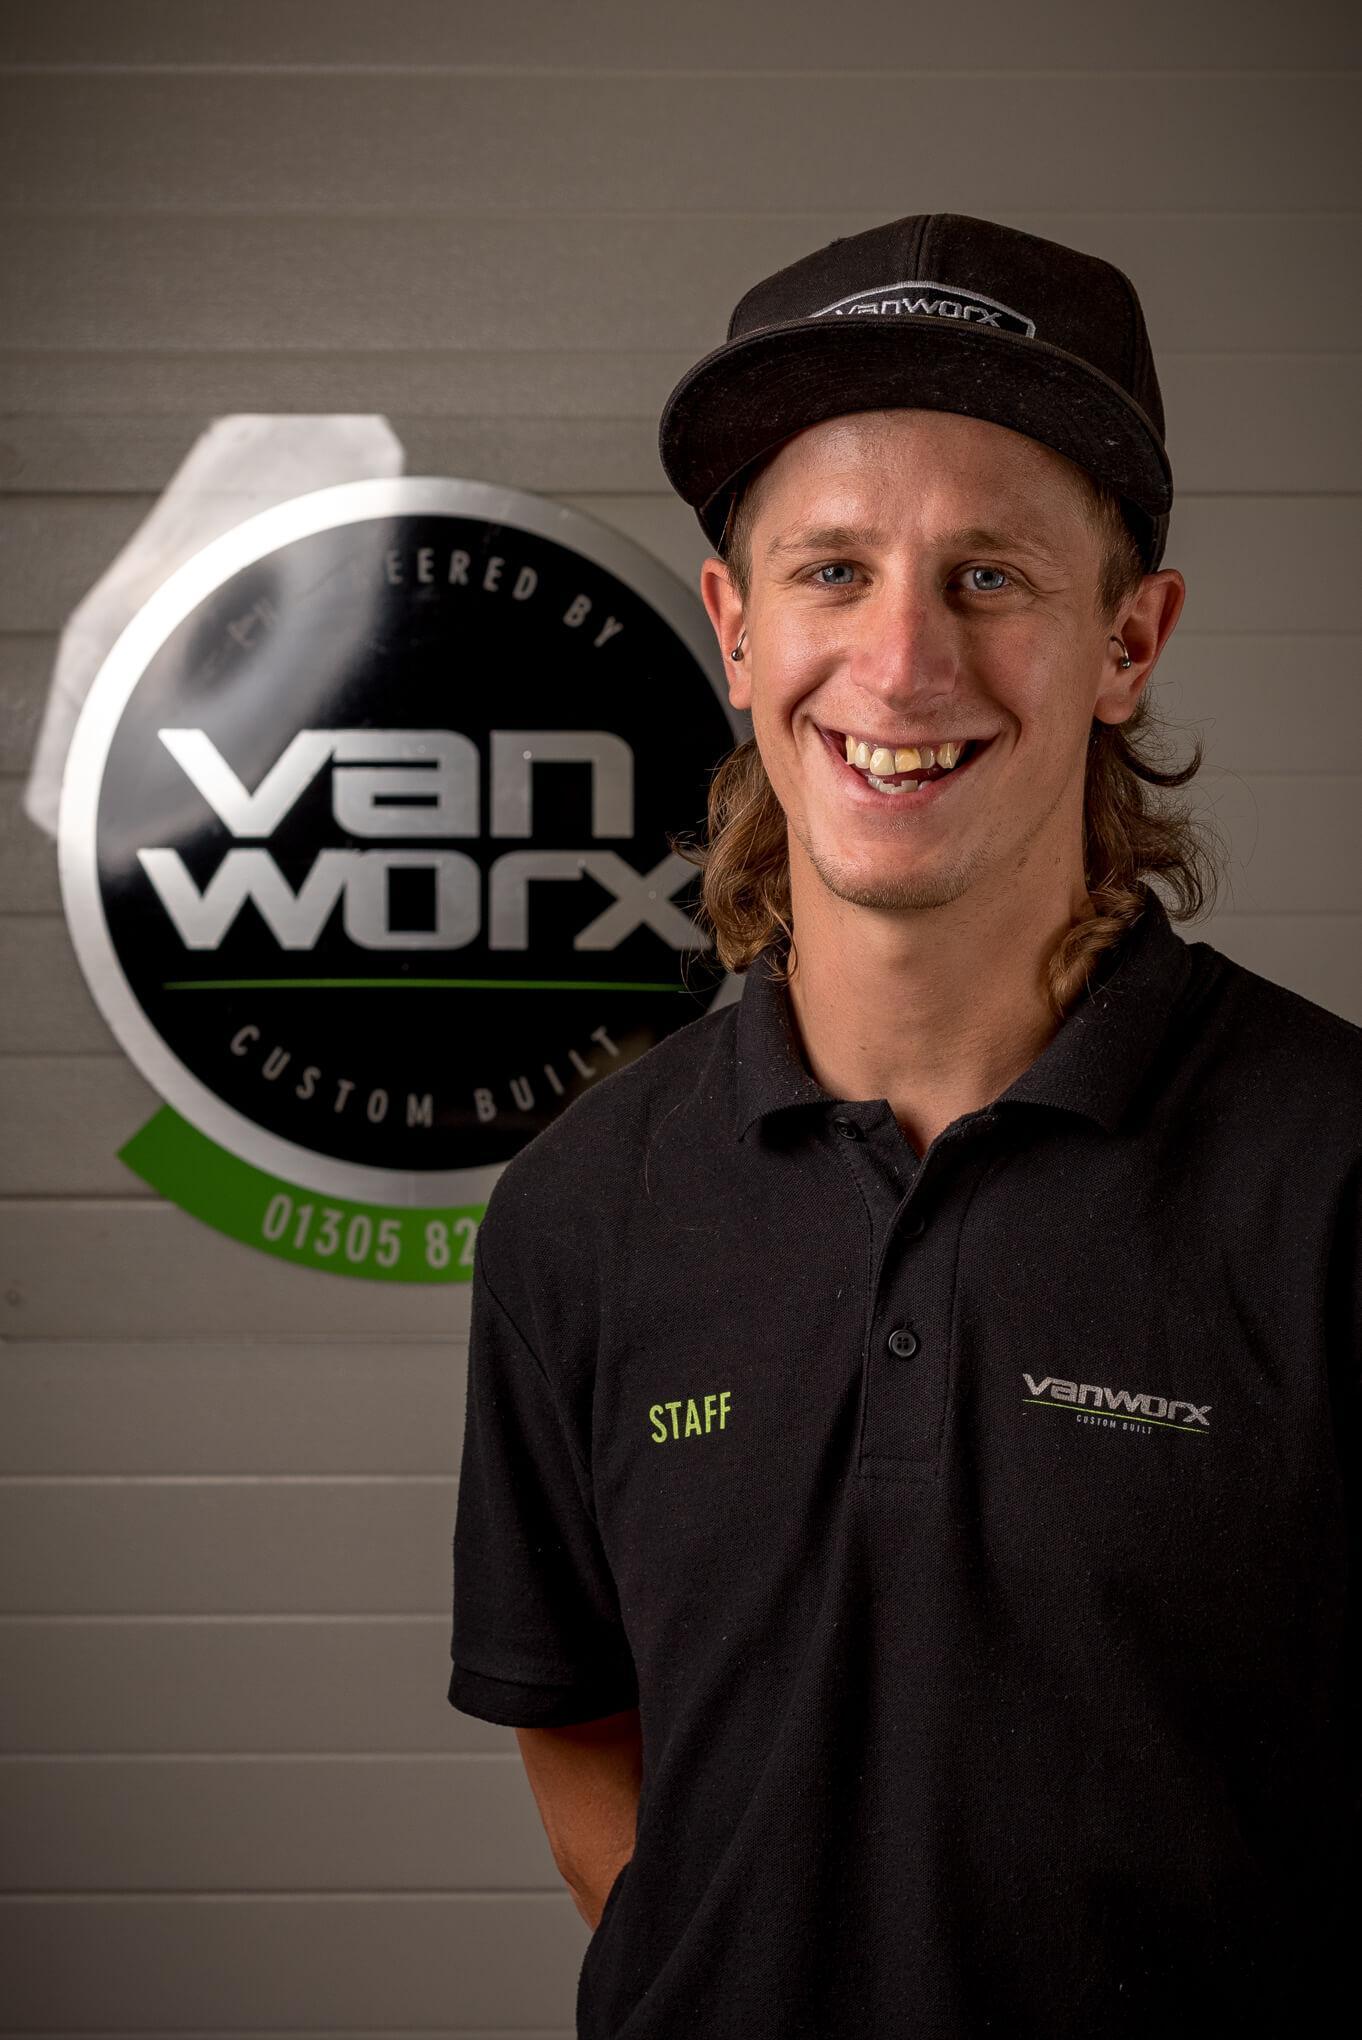 Vanworx Staff